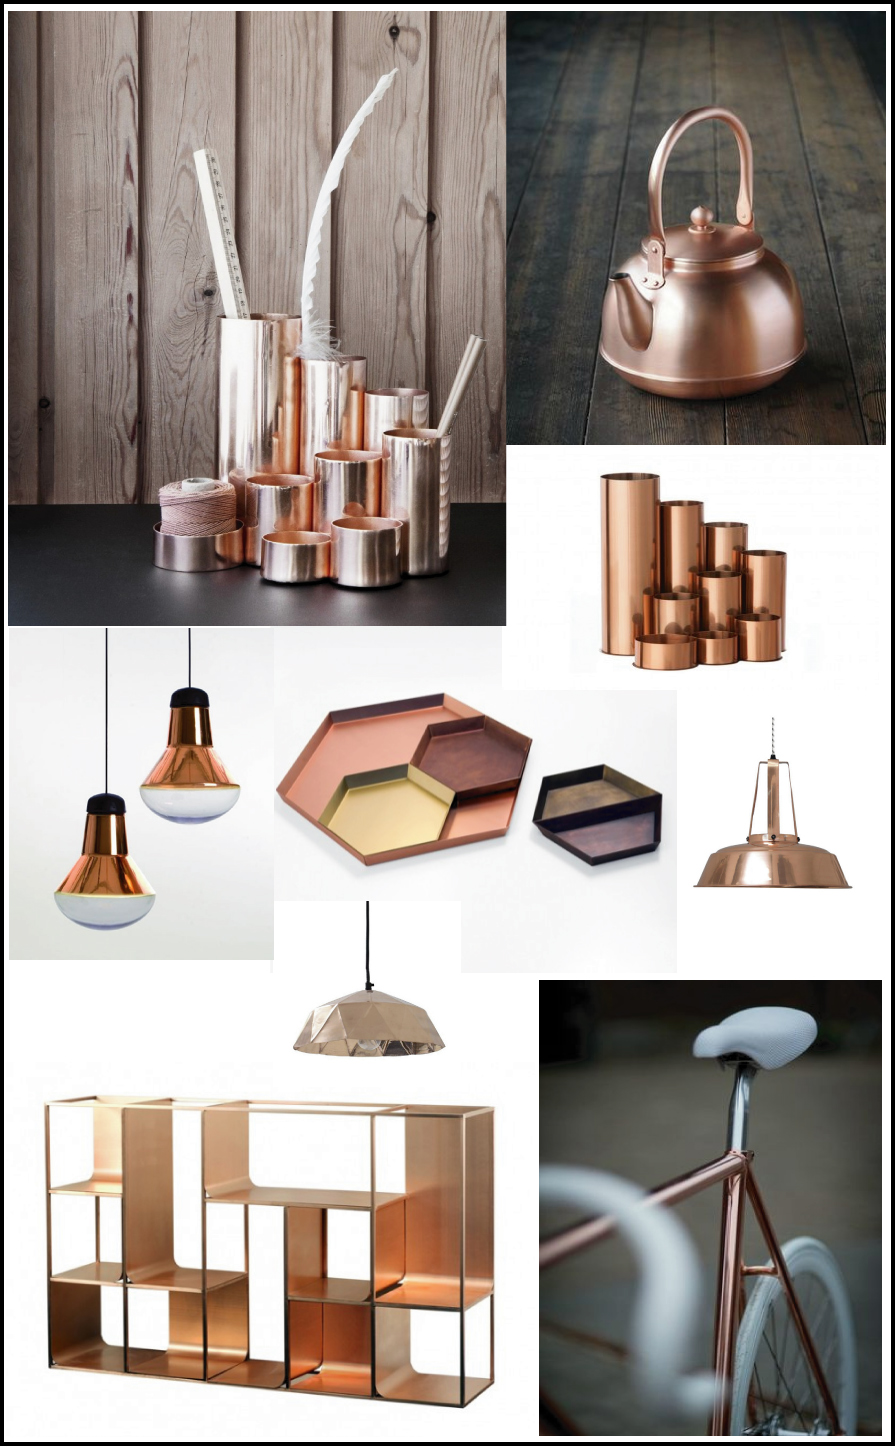 design cuivre chiara stella home. Black Bedroom Furniture Sets. Home Design Ideas